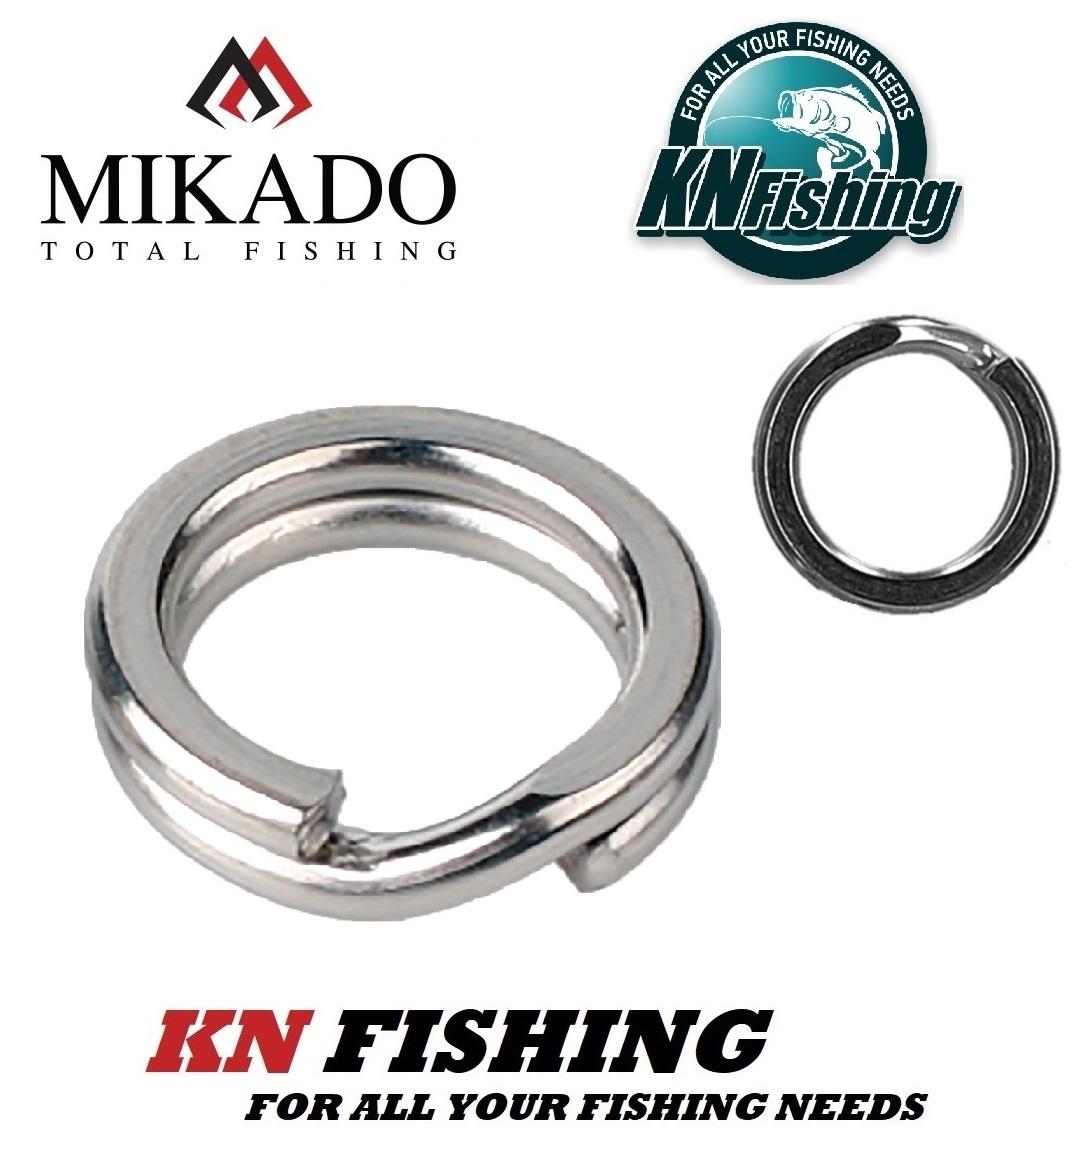 MIKADO SPLIT RING VERY HARD NICKEL 5 pcs